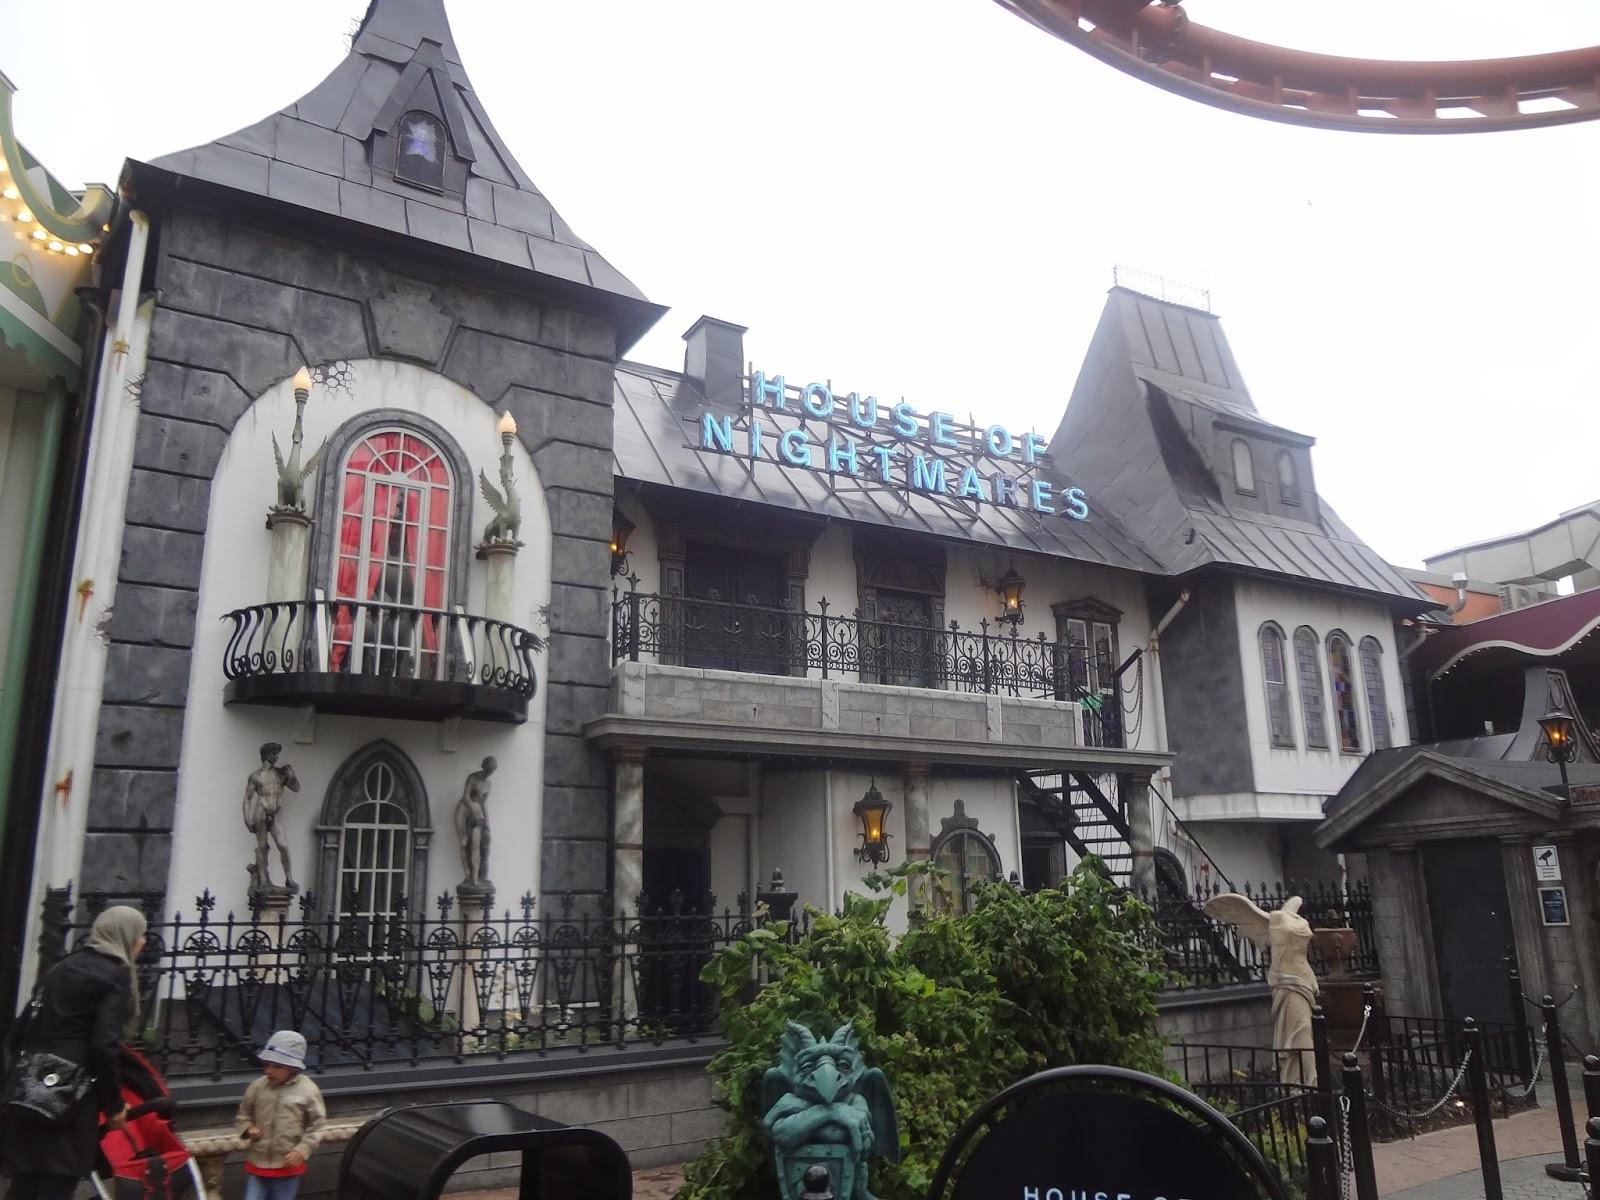 House of nightmare, maison hantée